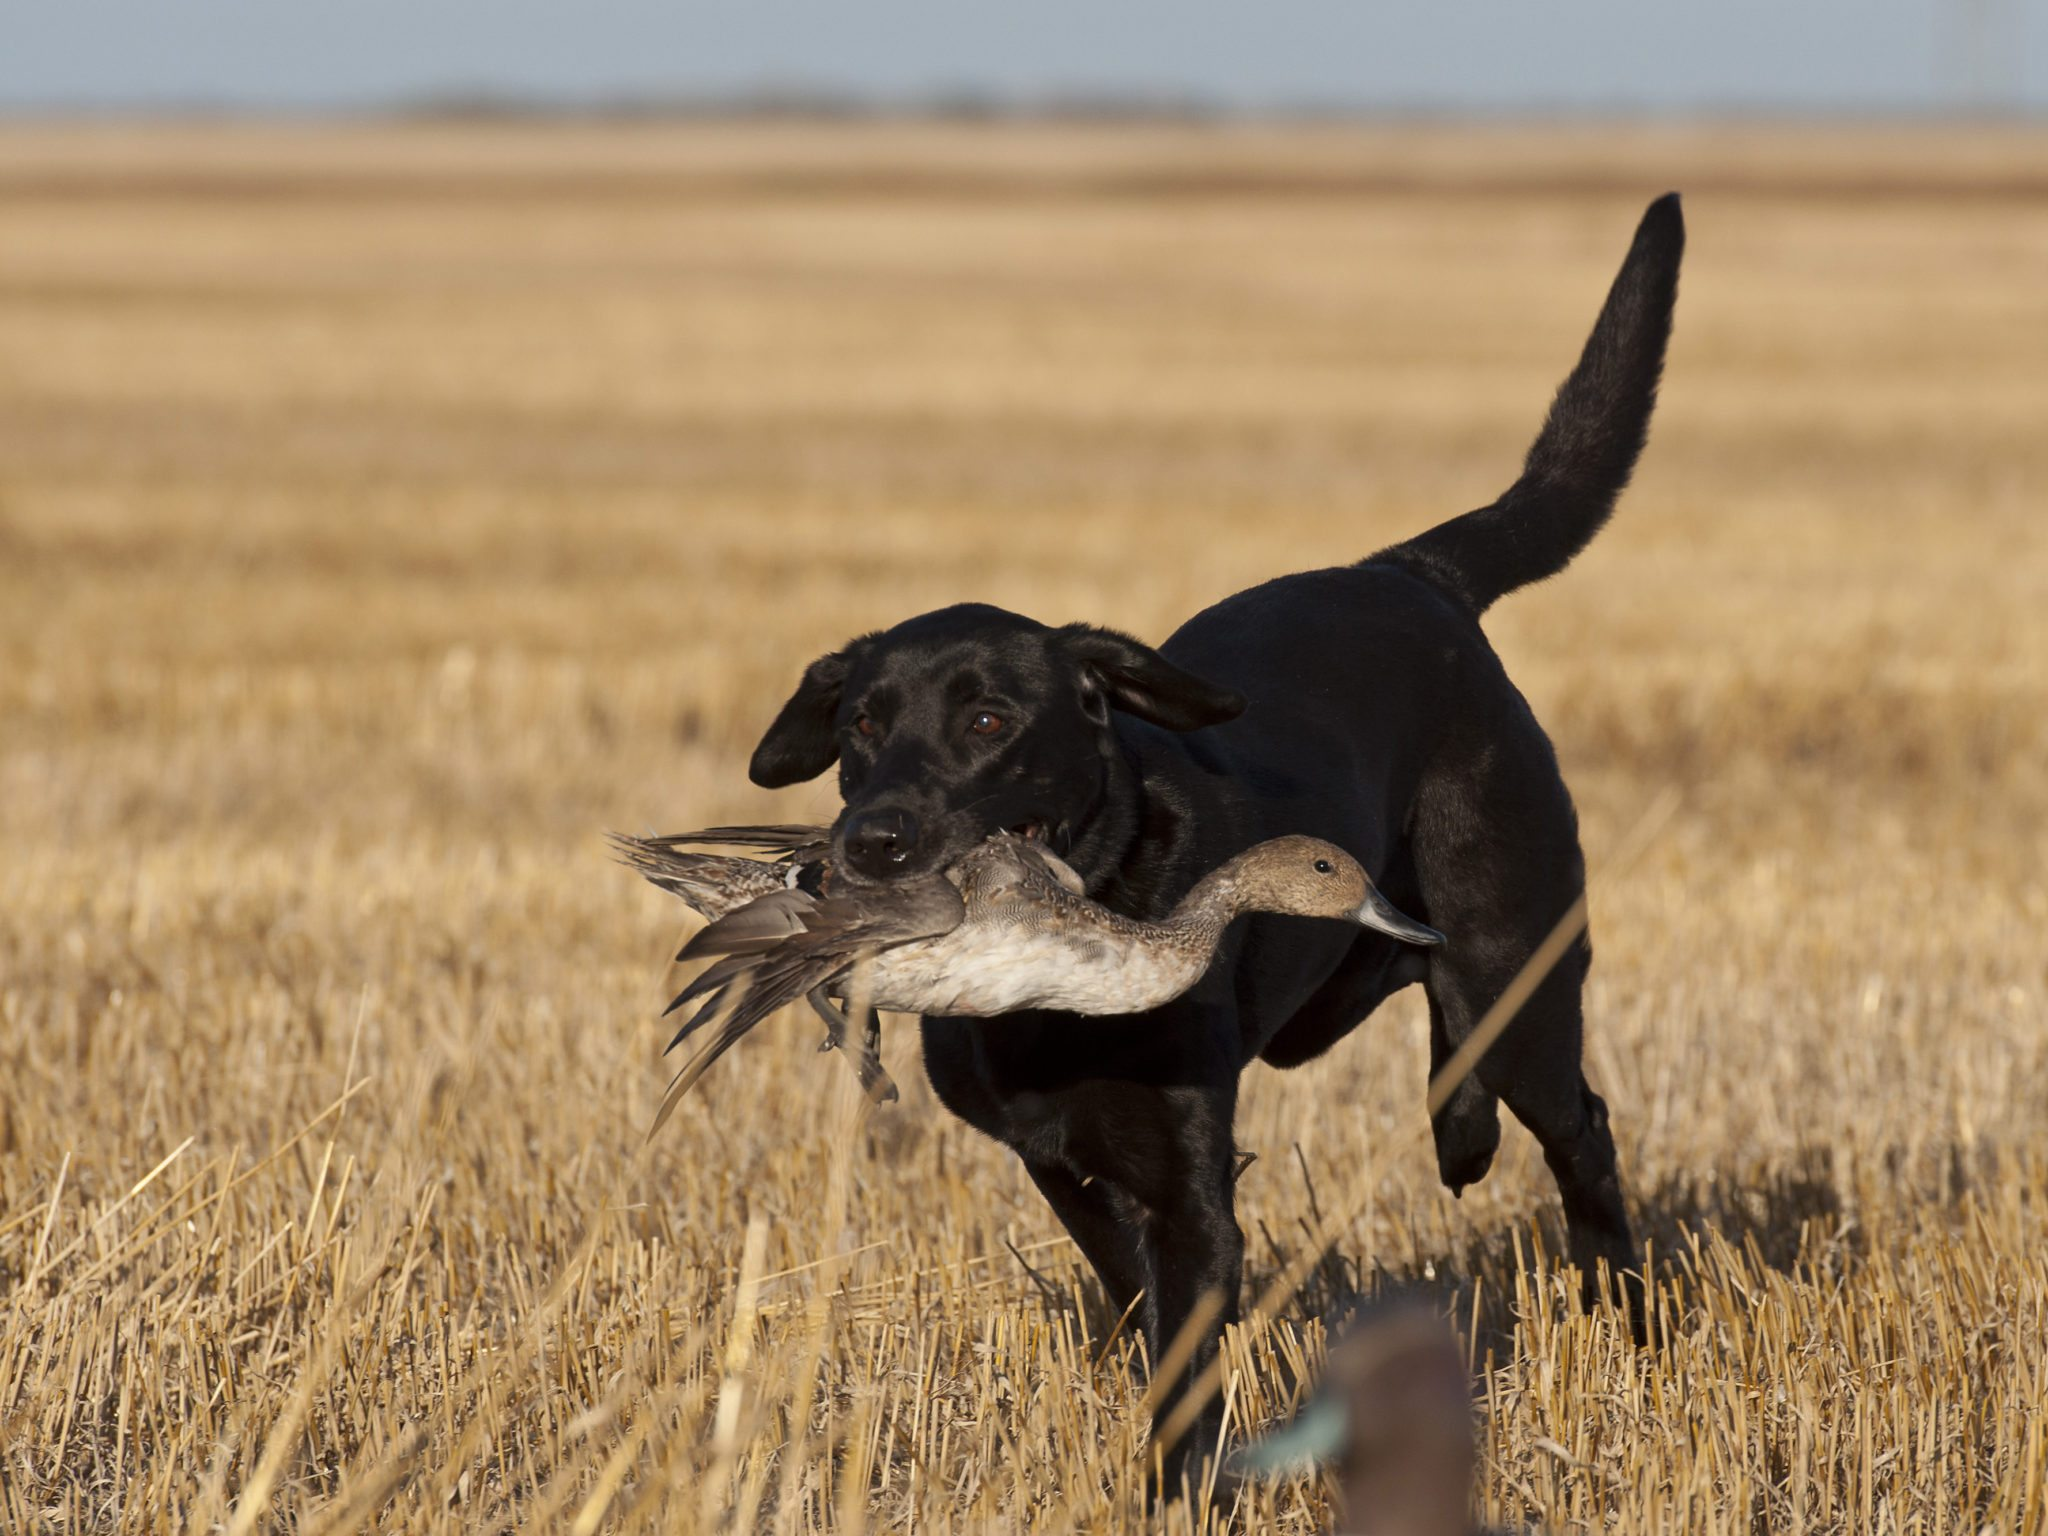 Double Reed Duck Calls Gun Dog